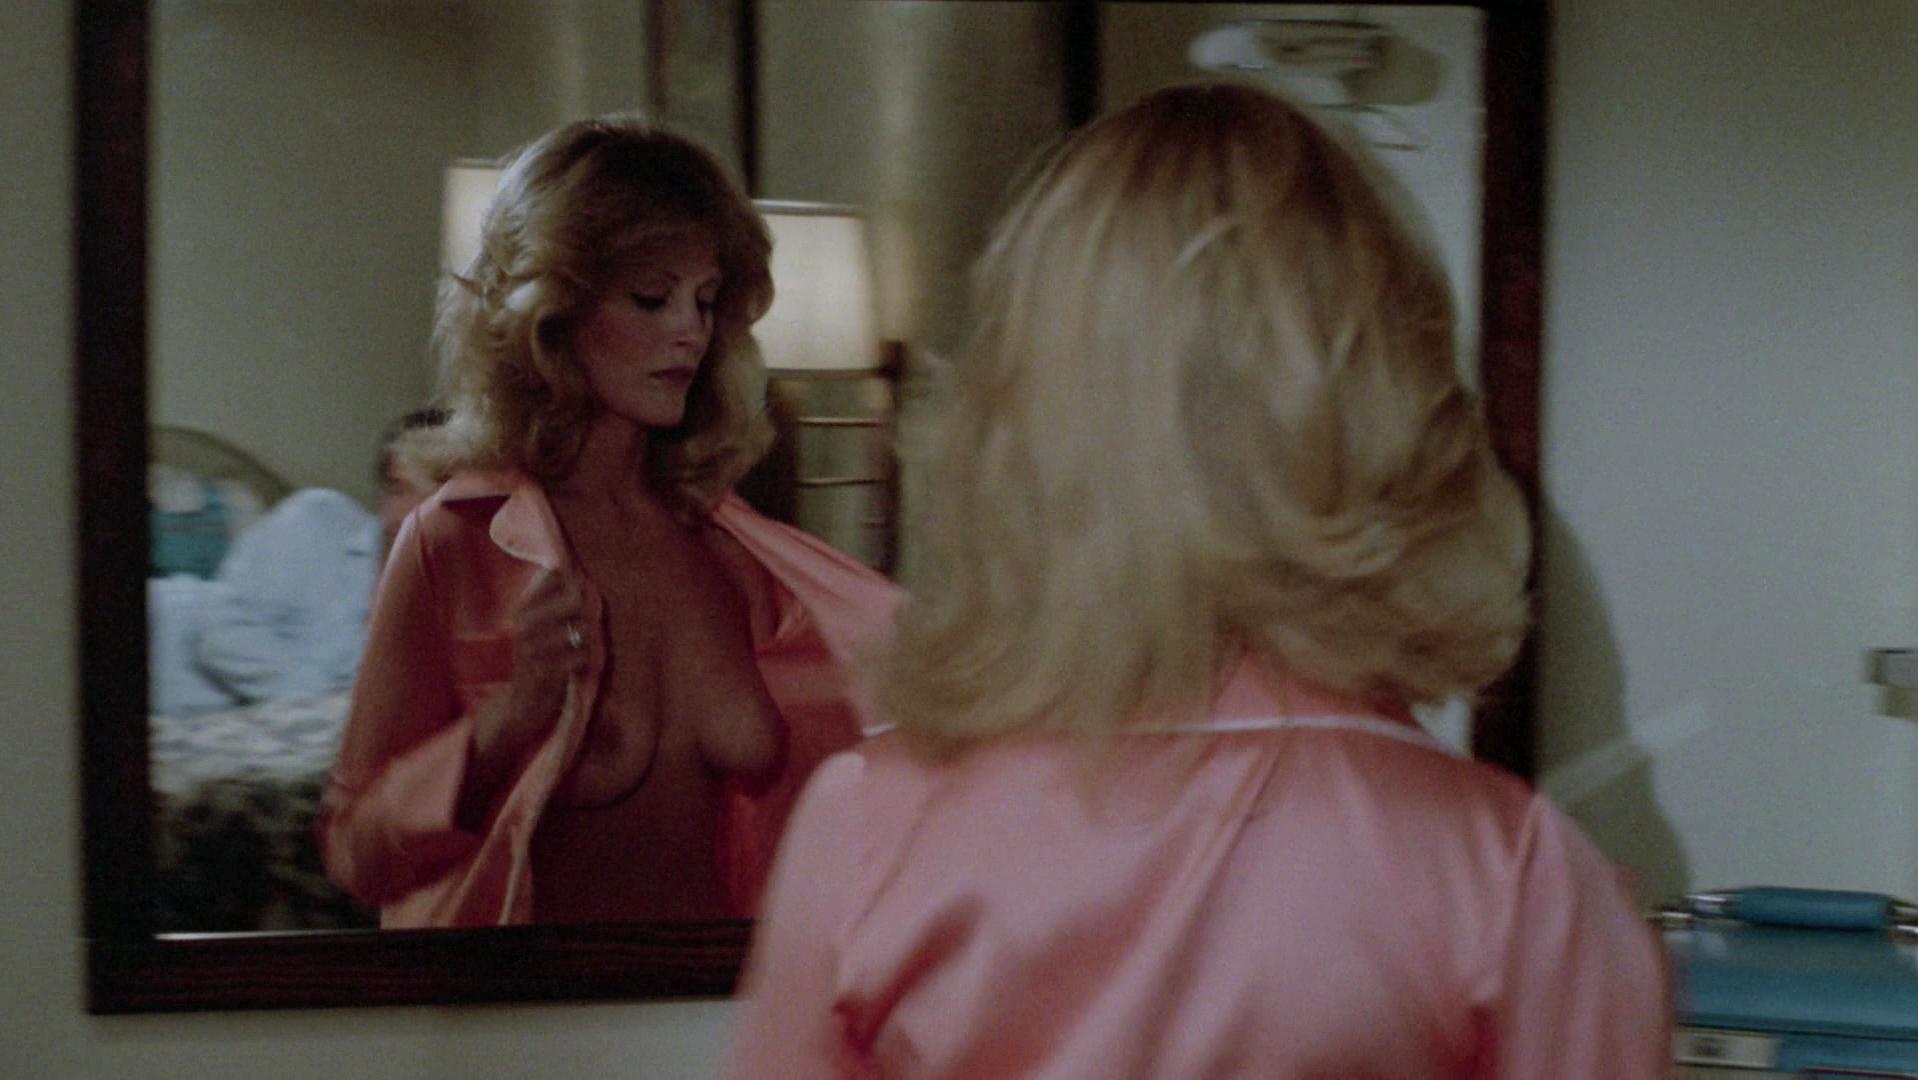 best of Nude Beverly shower scene deangelo